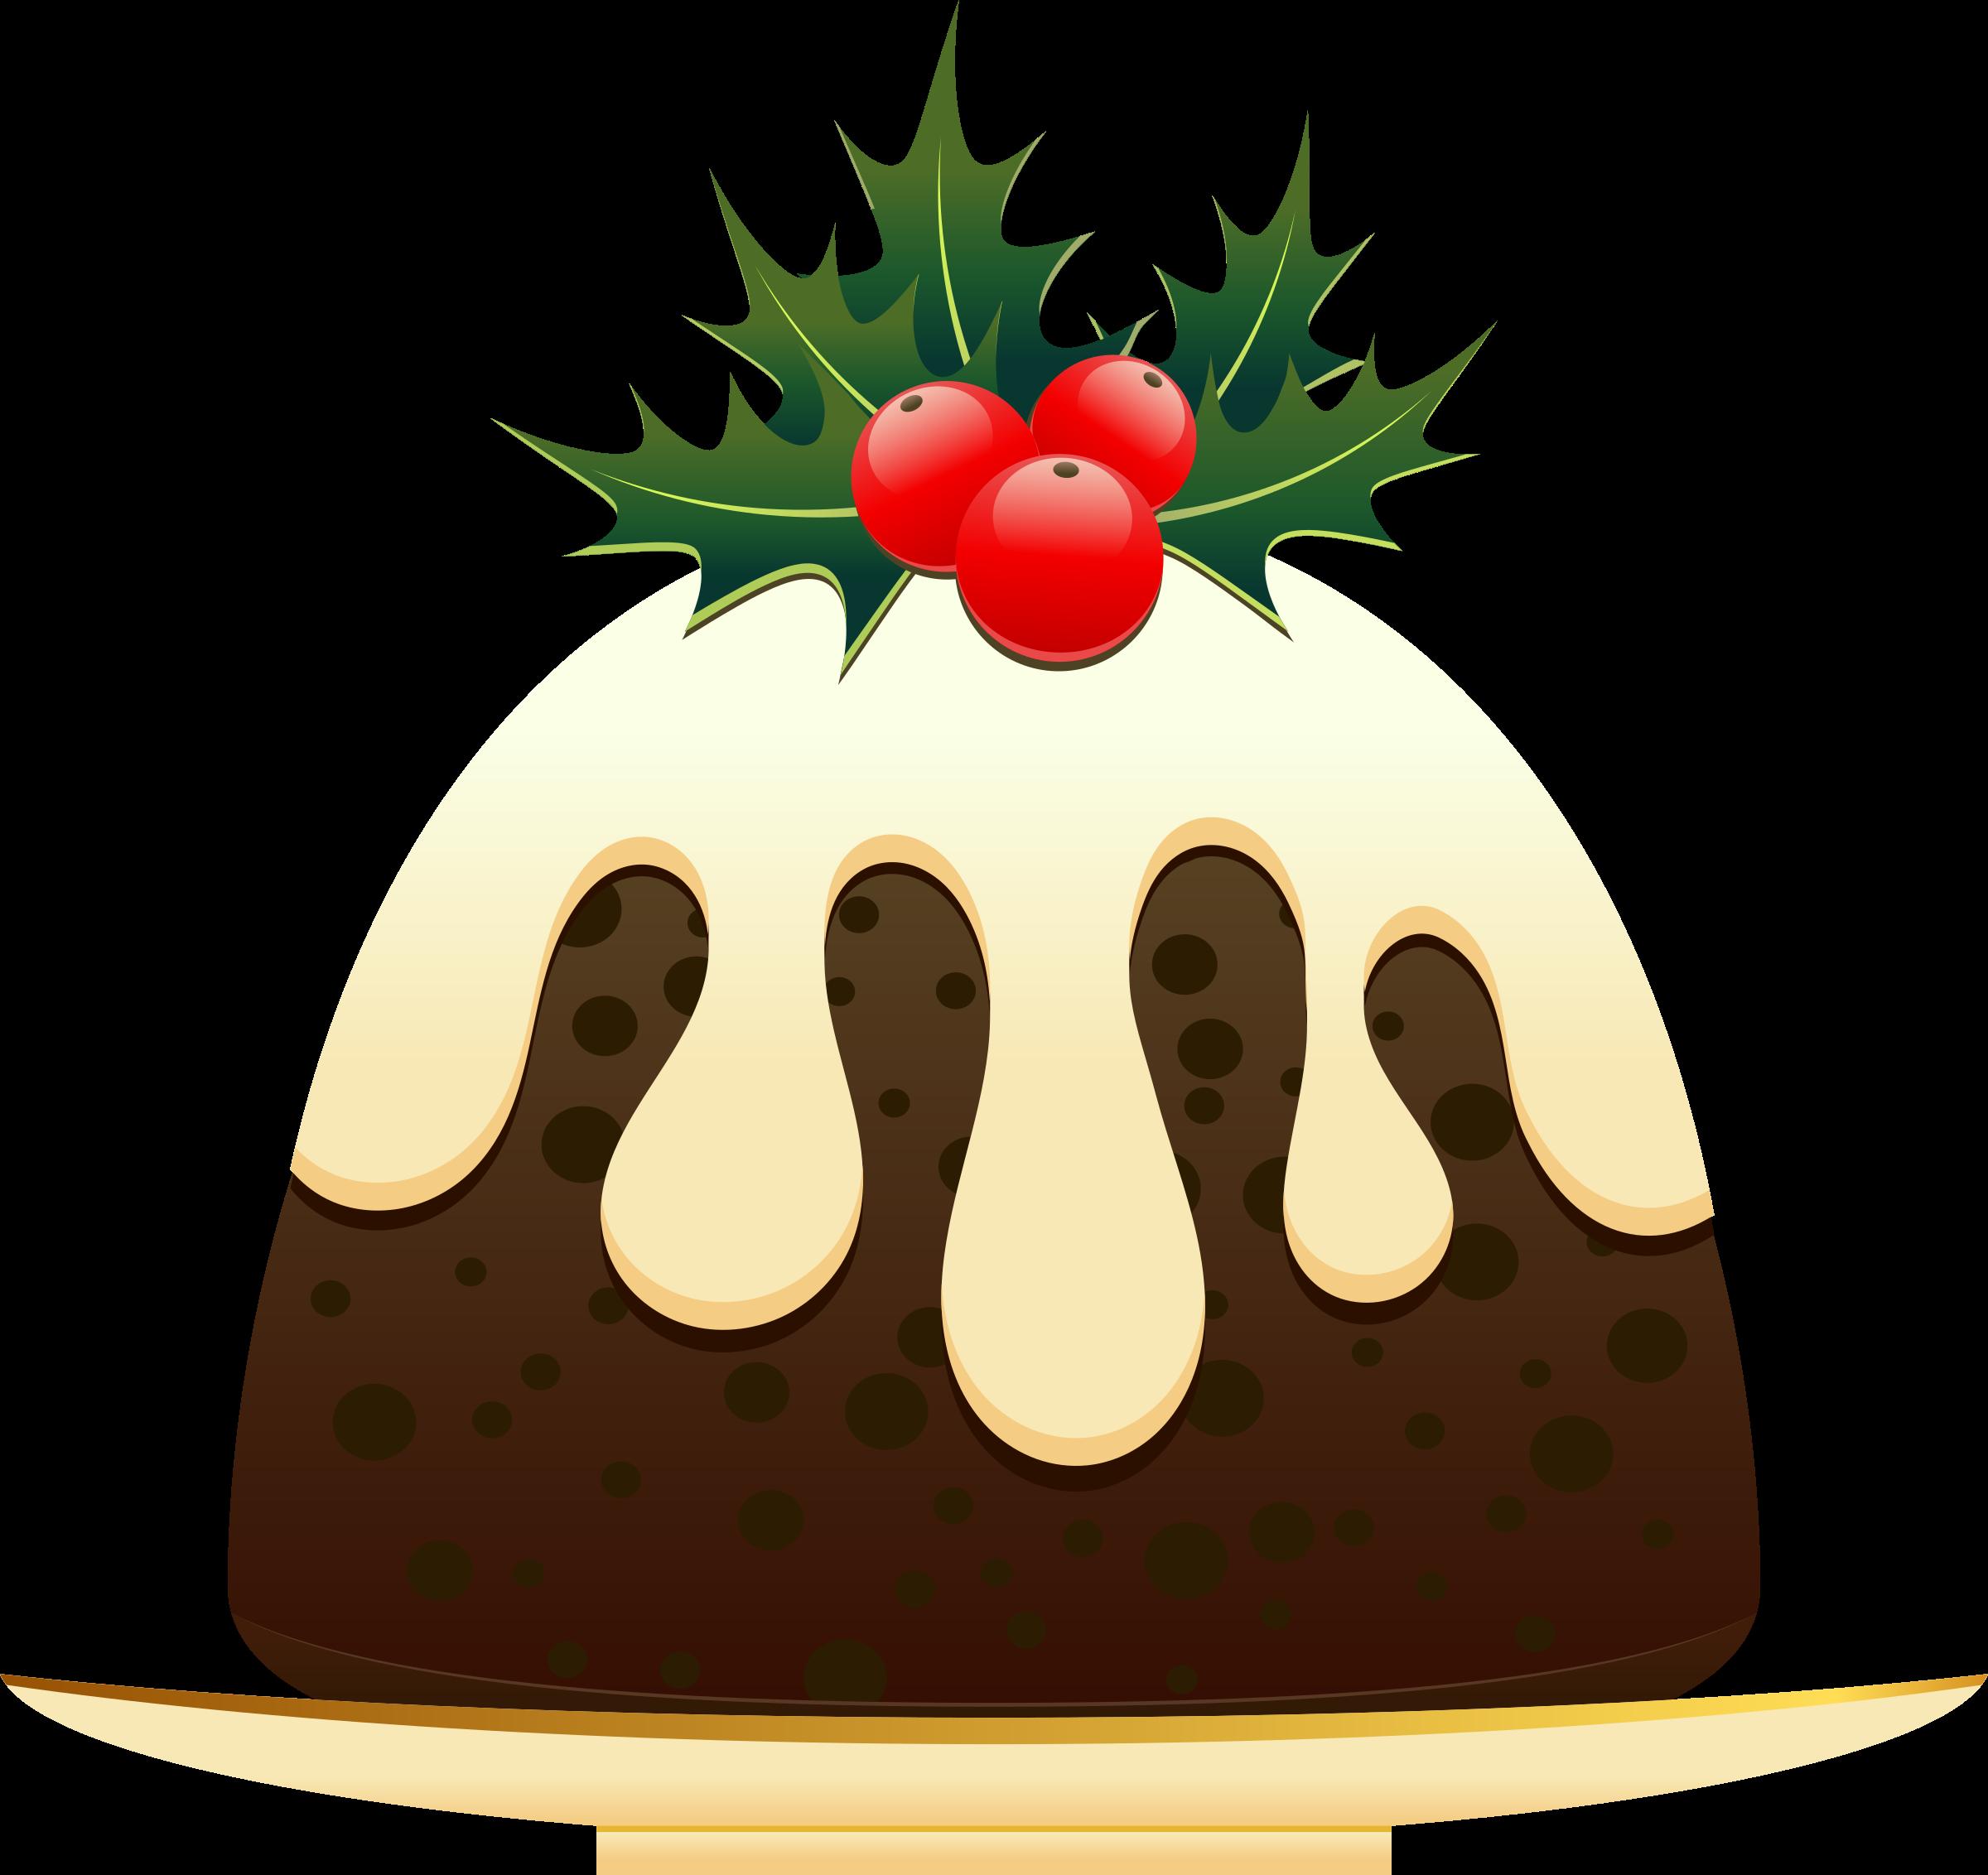 Christmas Pudding Images.